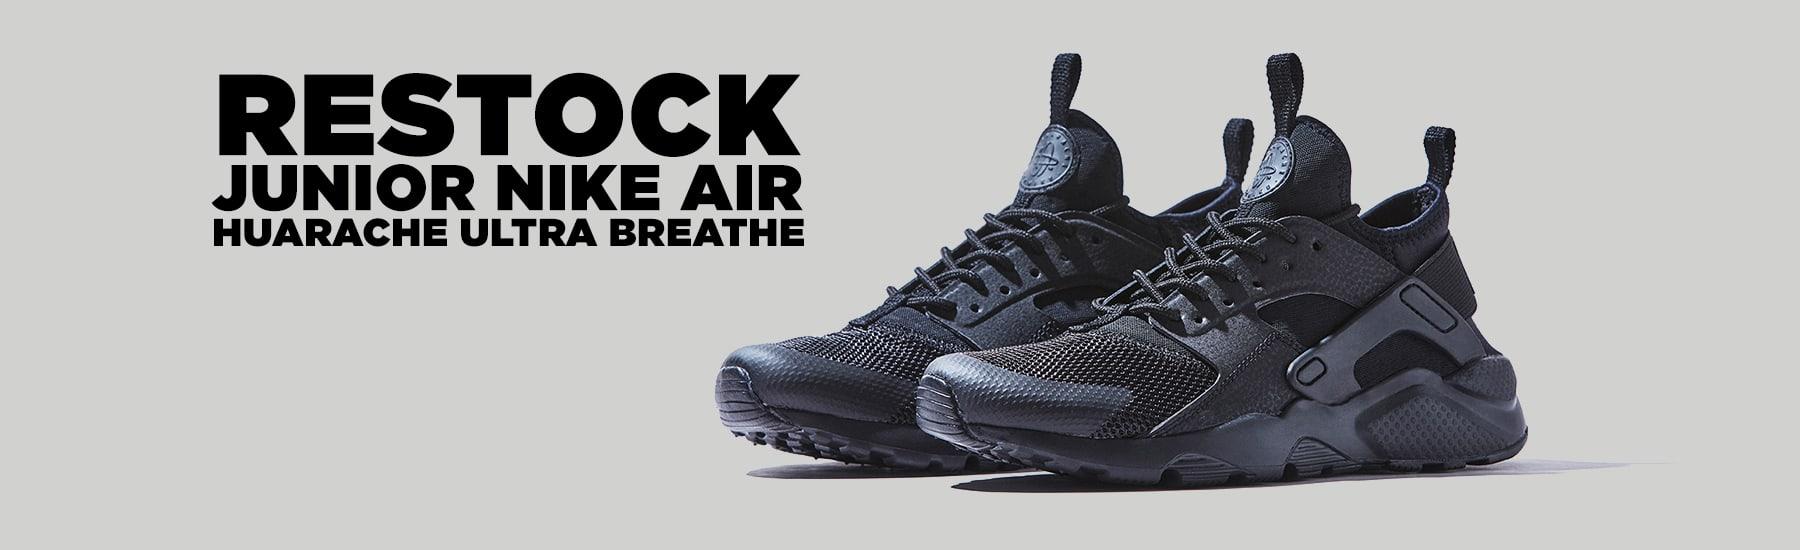 nike plus size activewear cheap adidas nmd kids boys